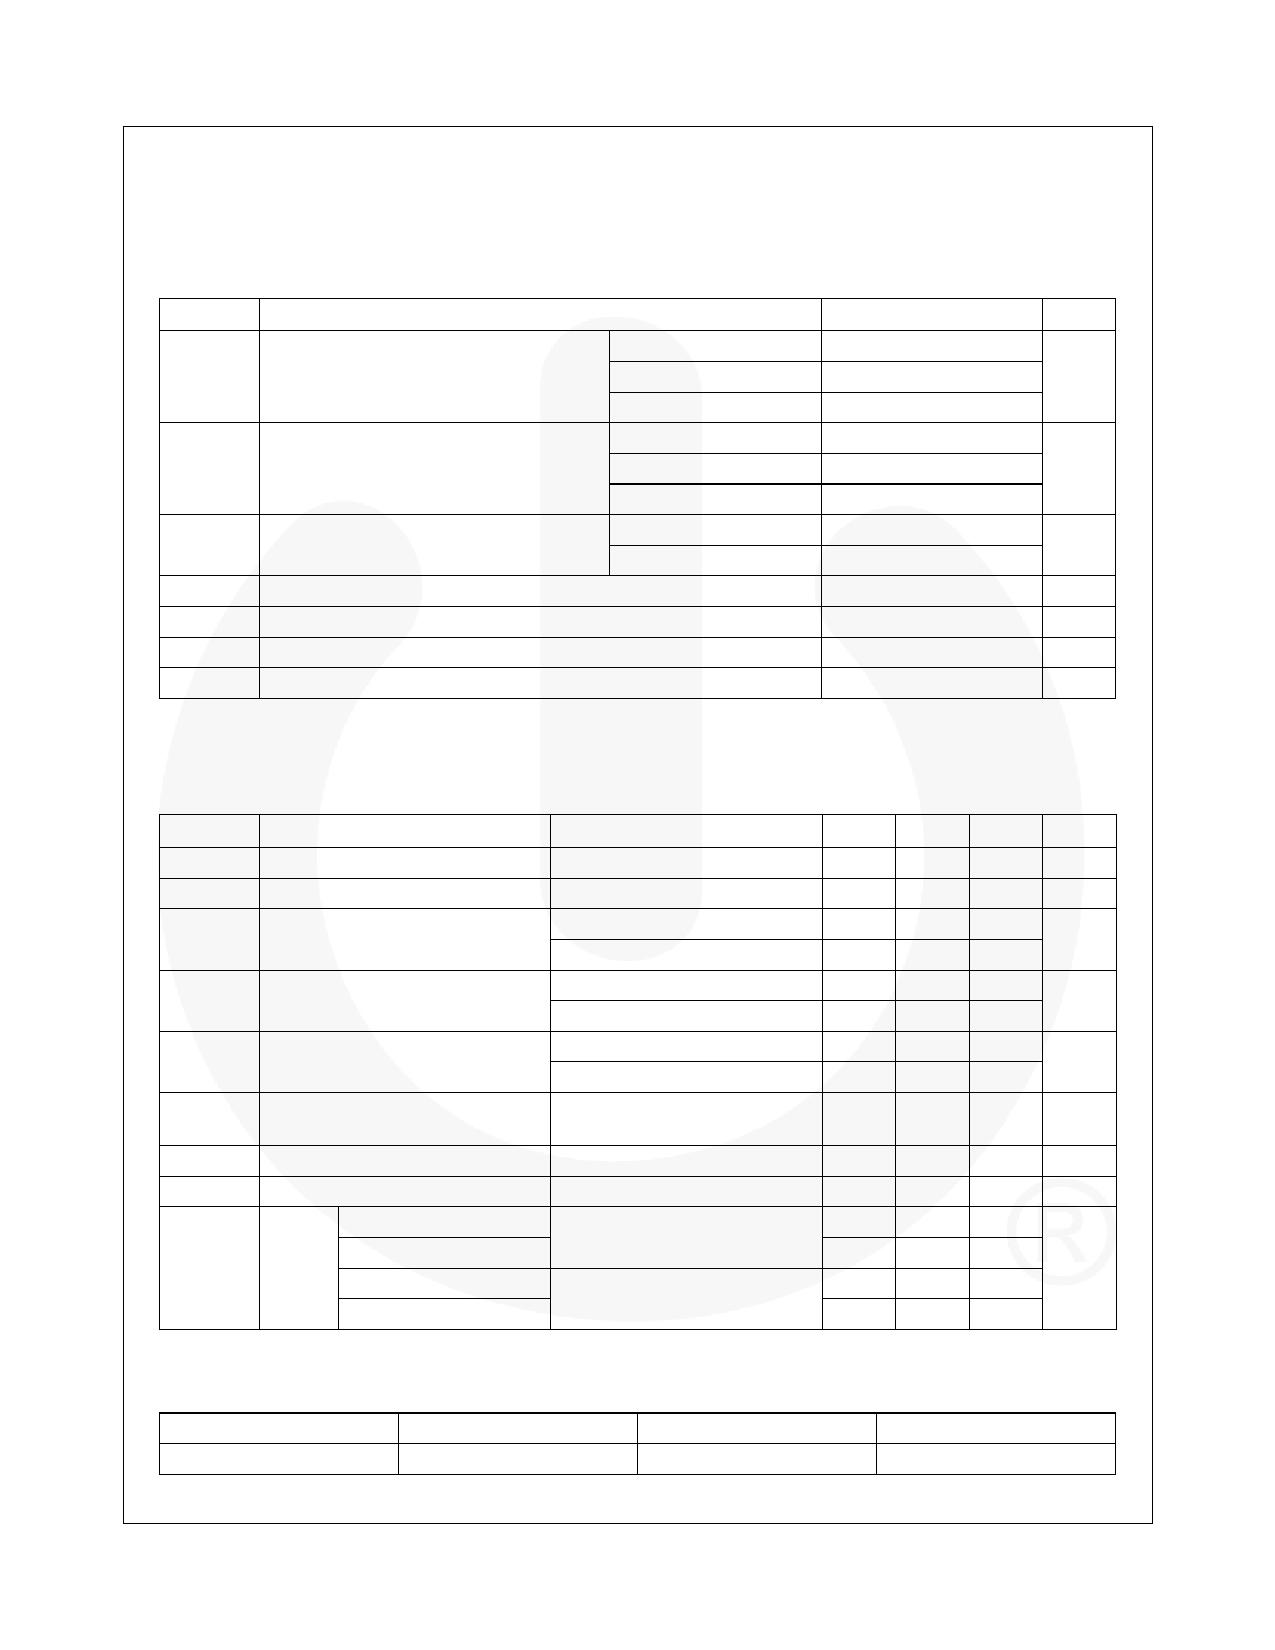 BC548 pdf pinout